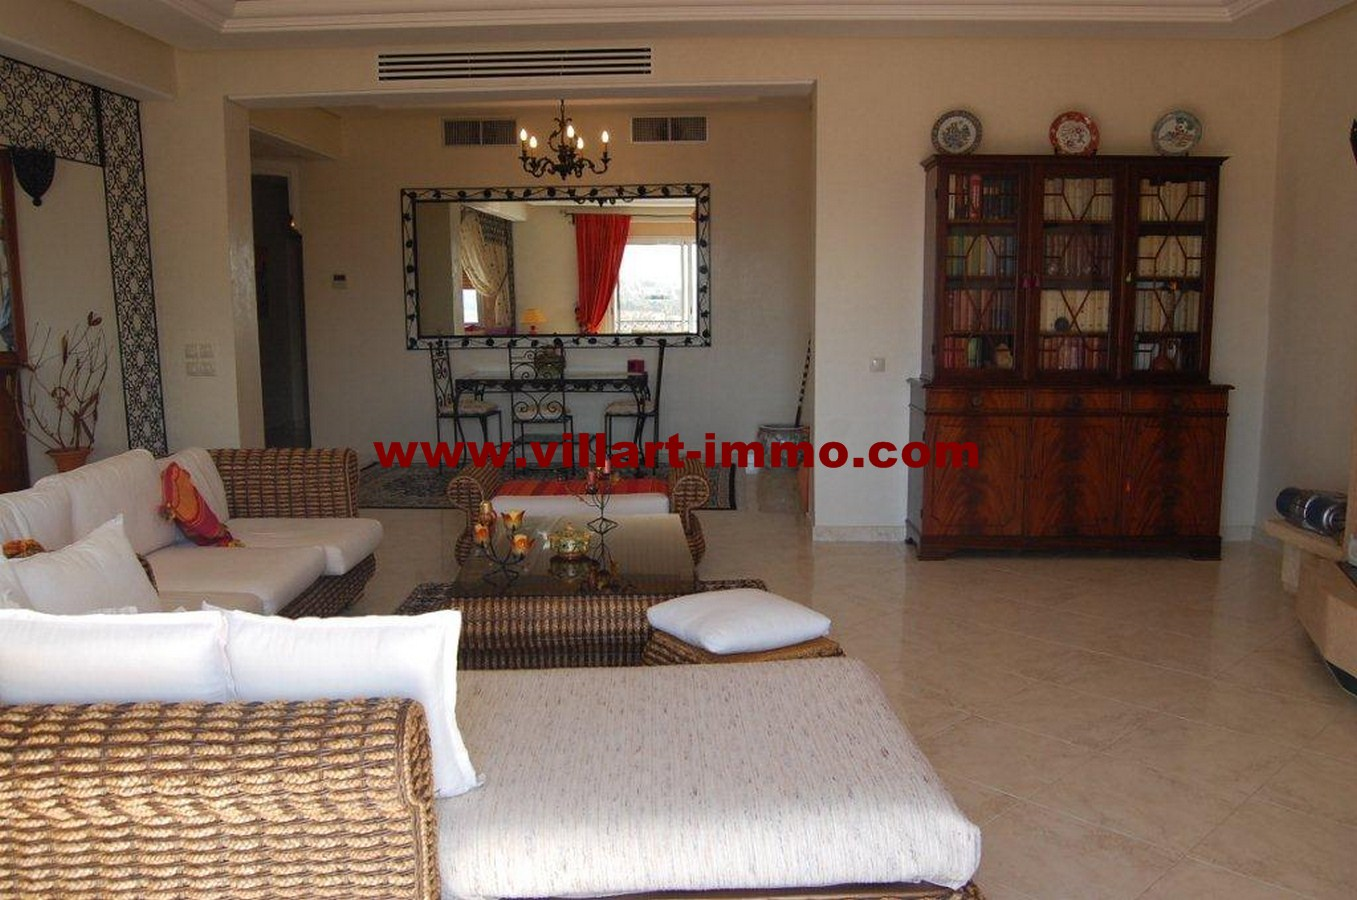 6-vente-appartement-tanger-la-montagne-salon-5-va452-villart-immo